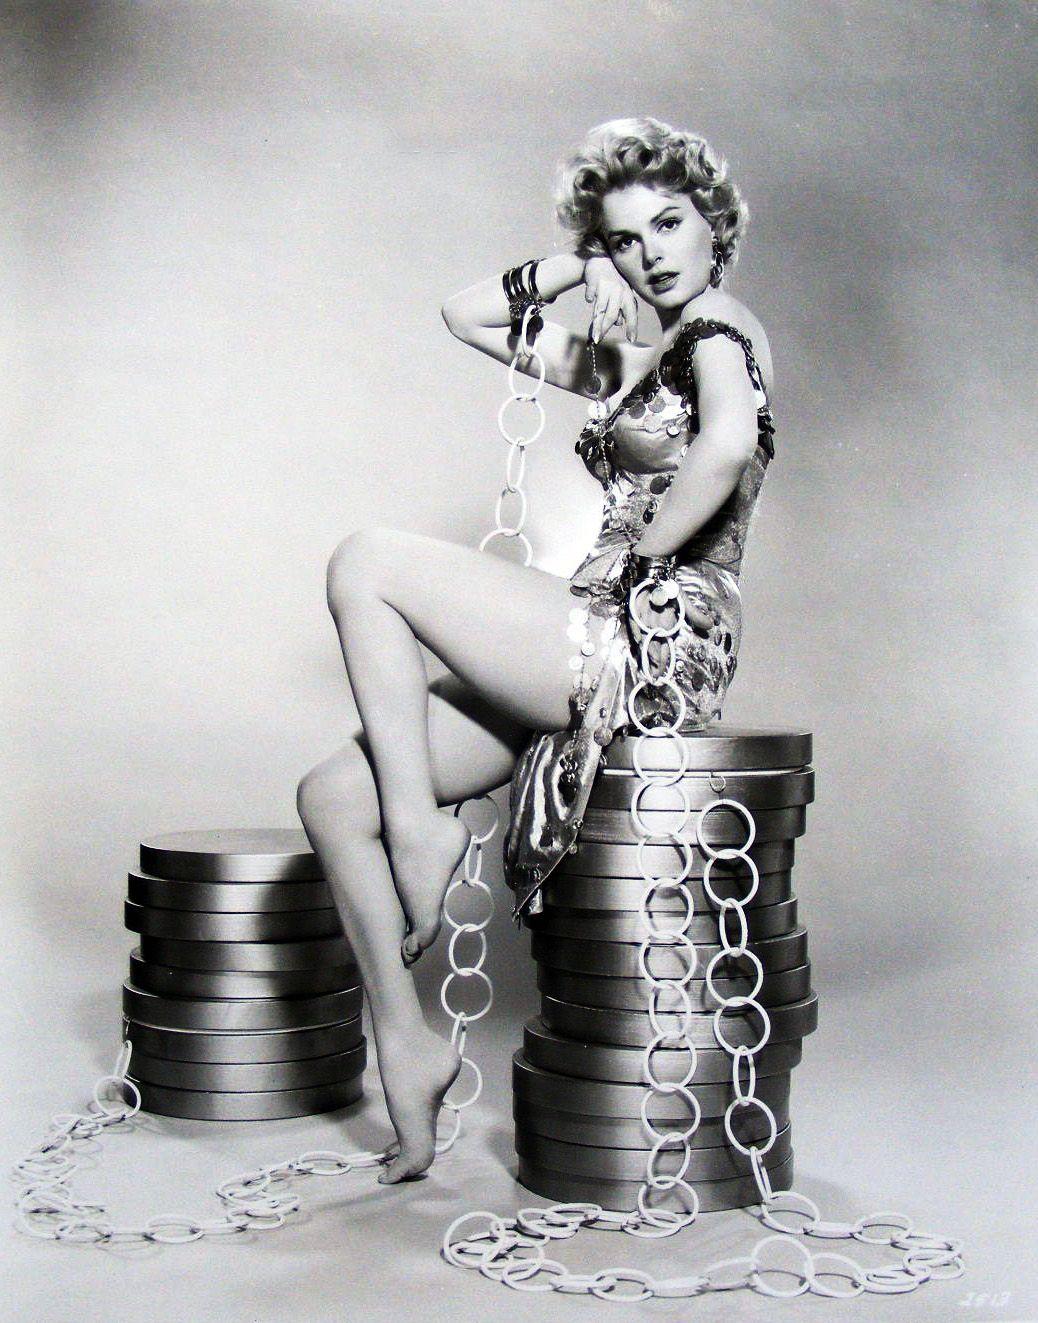 Barbara Lang (film actress) nudes (84 foto and video), Ass, Bikini, Feet, legs 2017